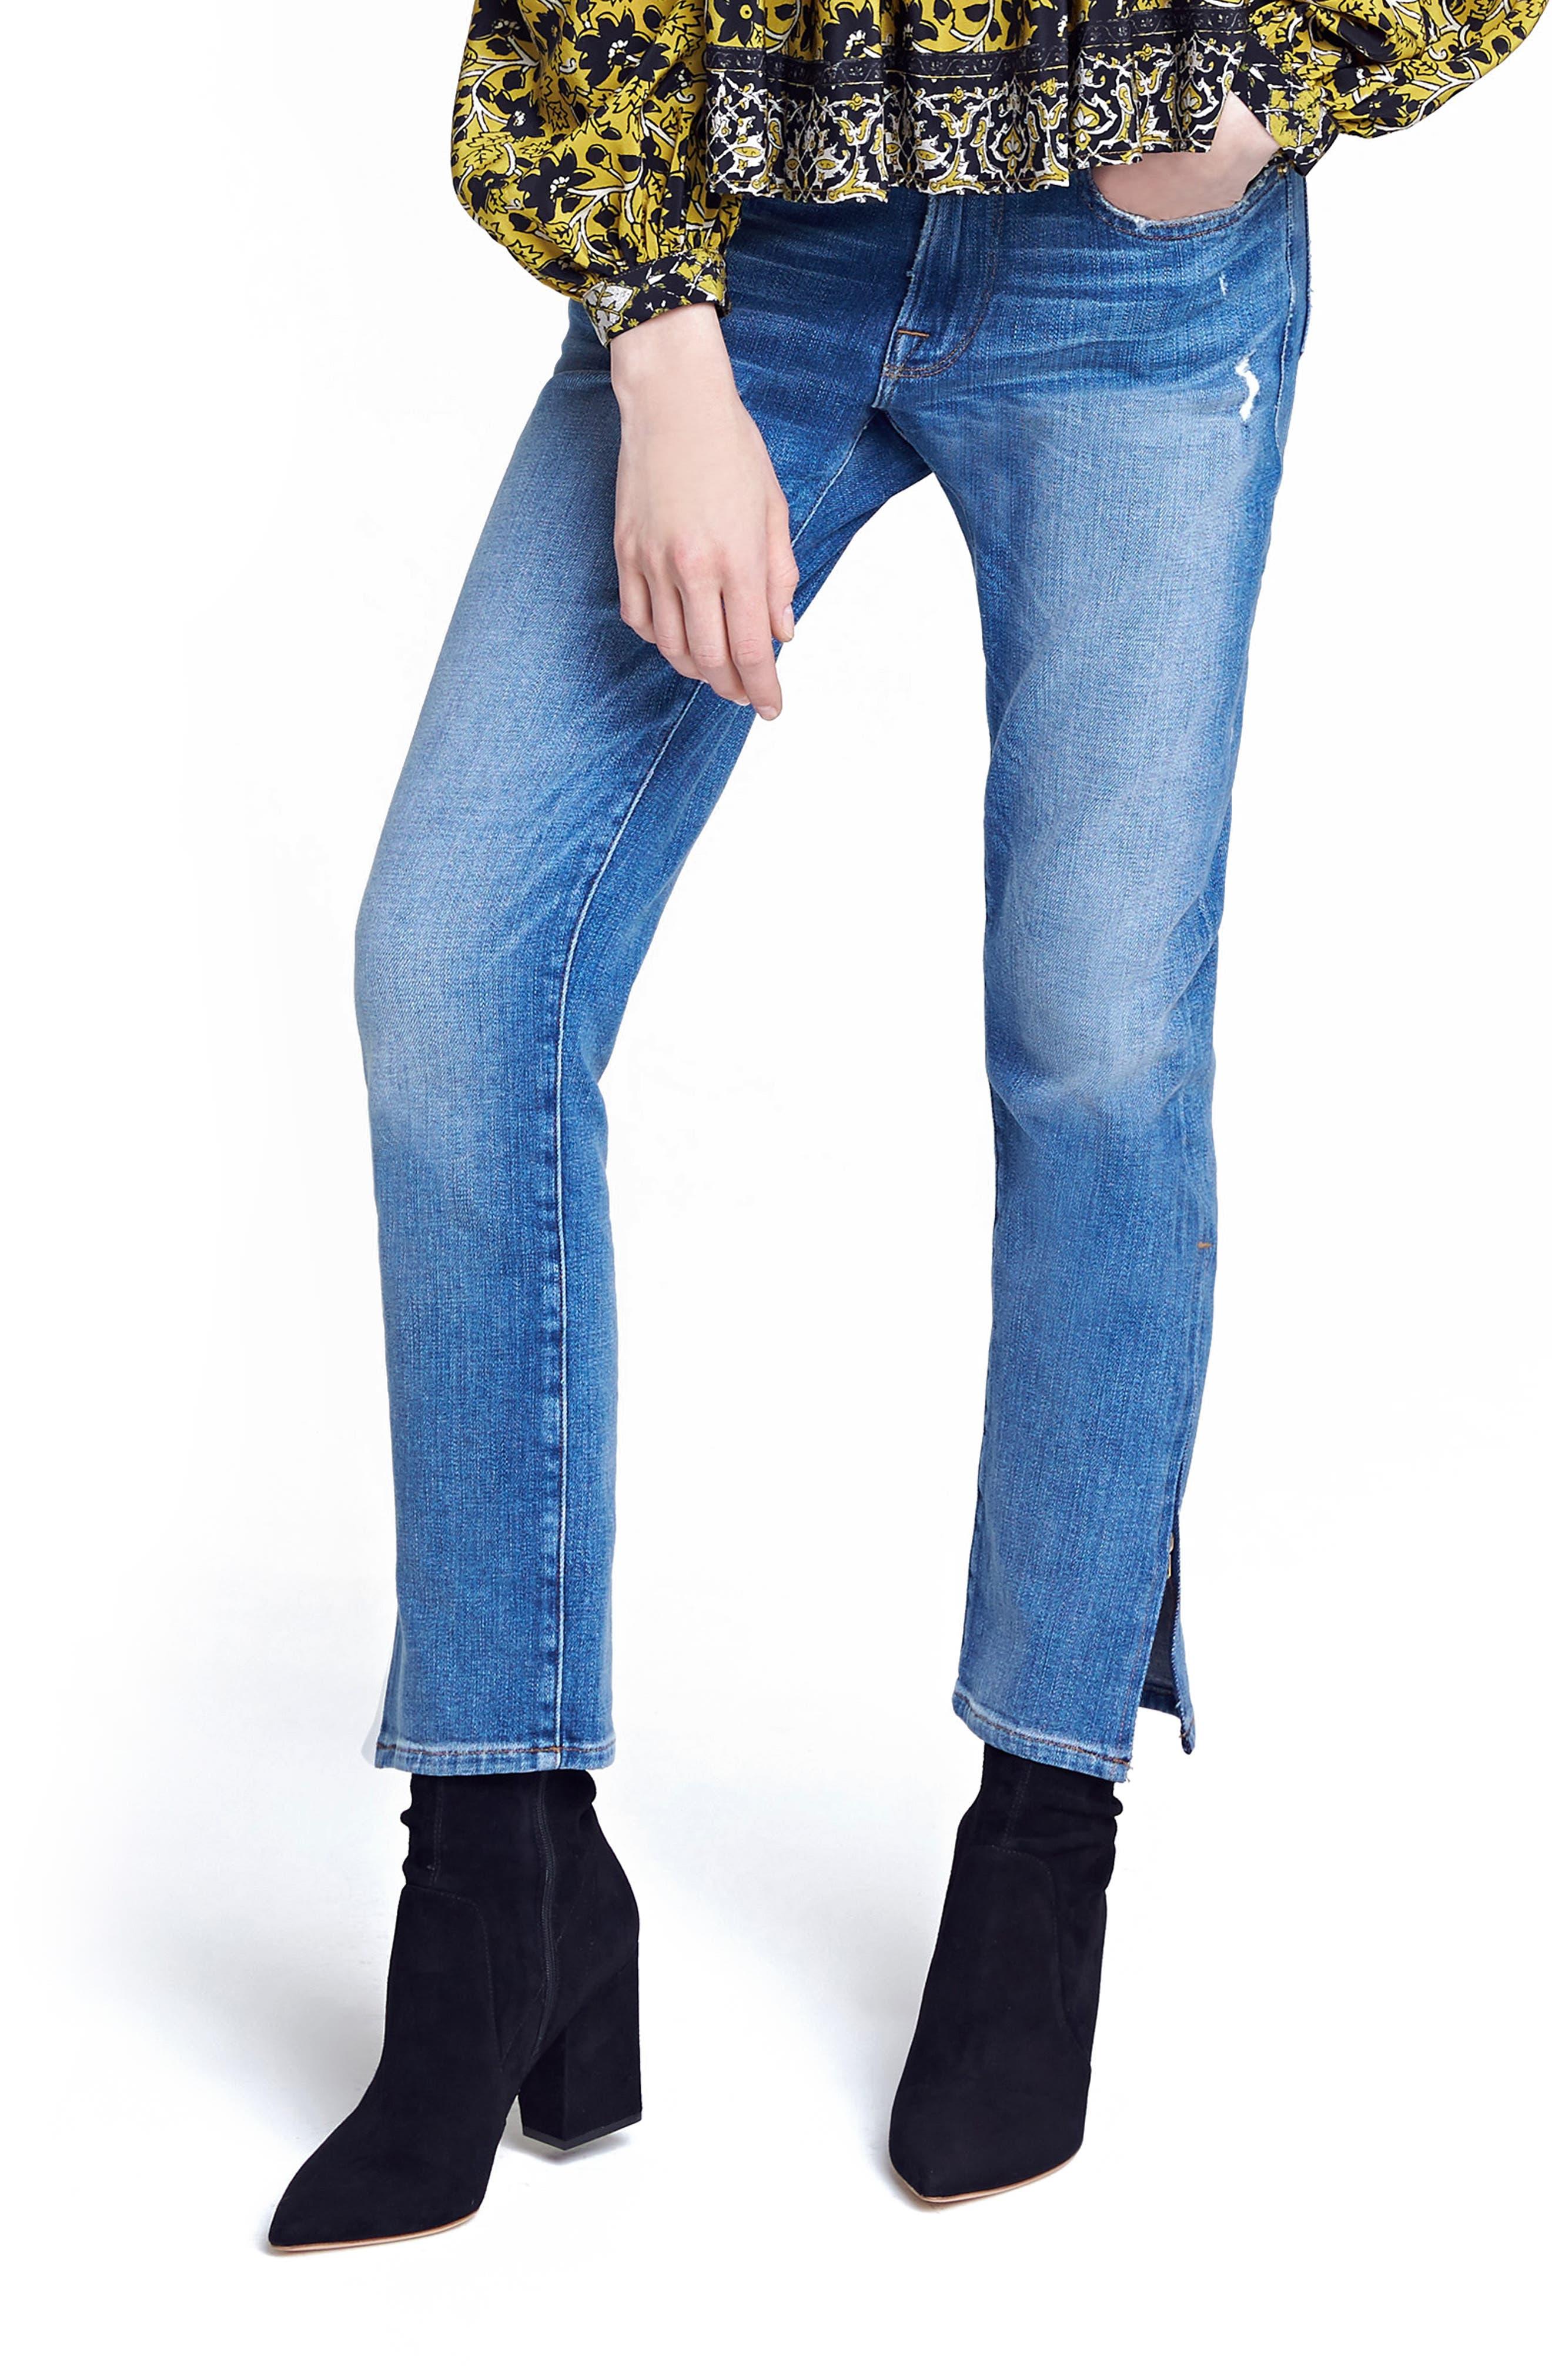 Alternate Image 1 Selected - FRAME Le Boy Zip Hem Crop Jeans (Picadilly) (Nordstrom Exclusive)